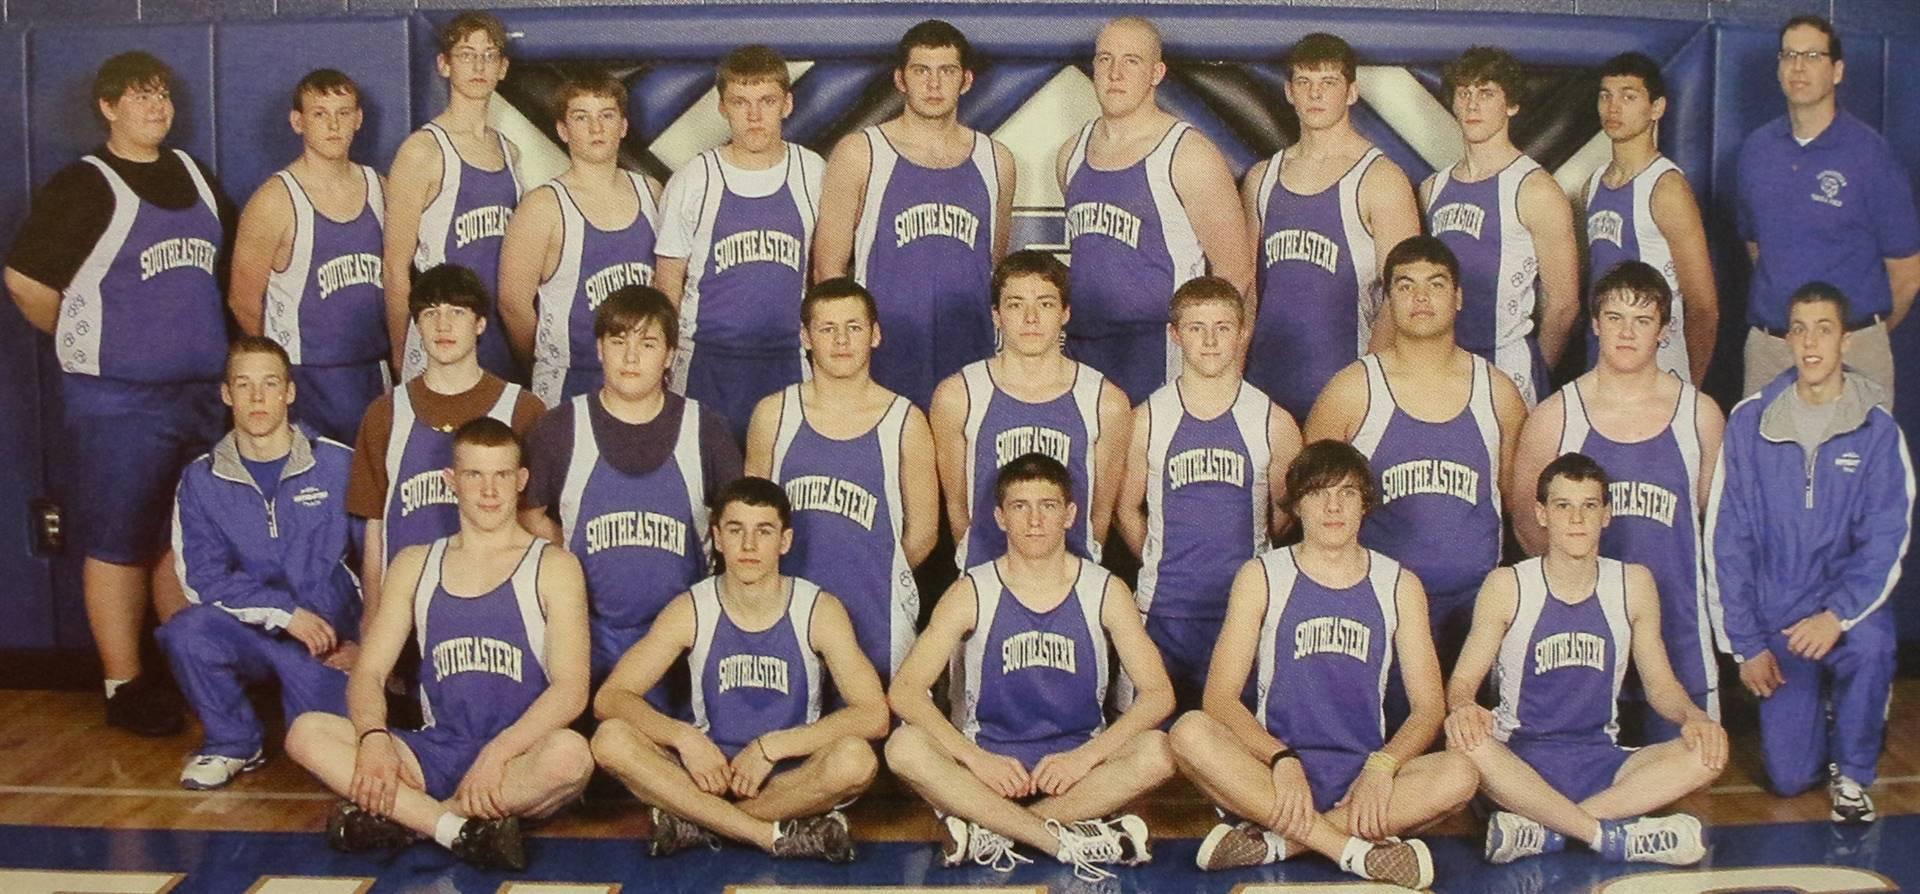 2007 boys track